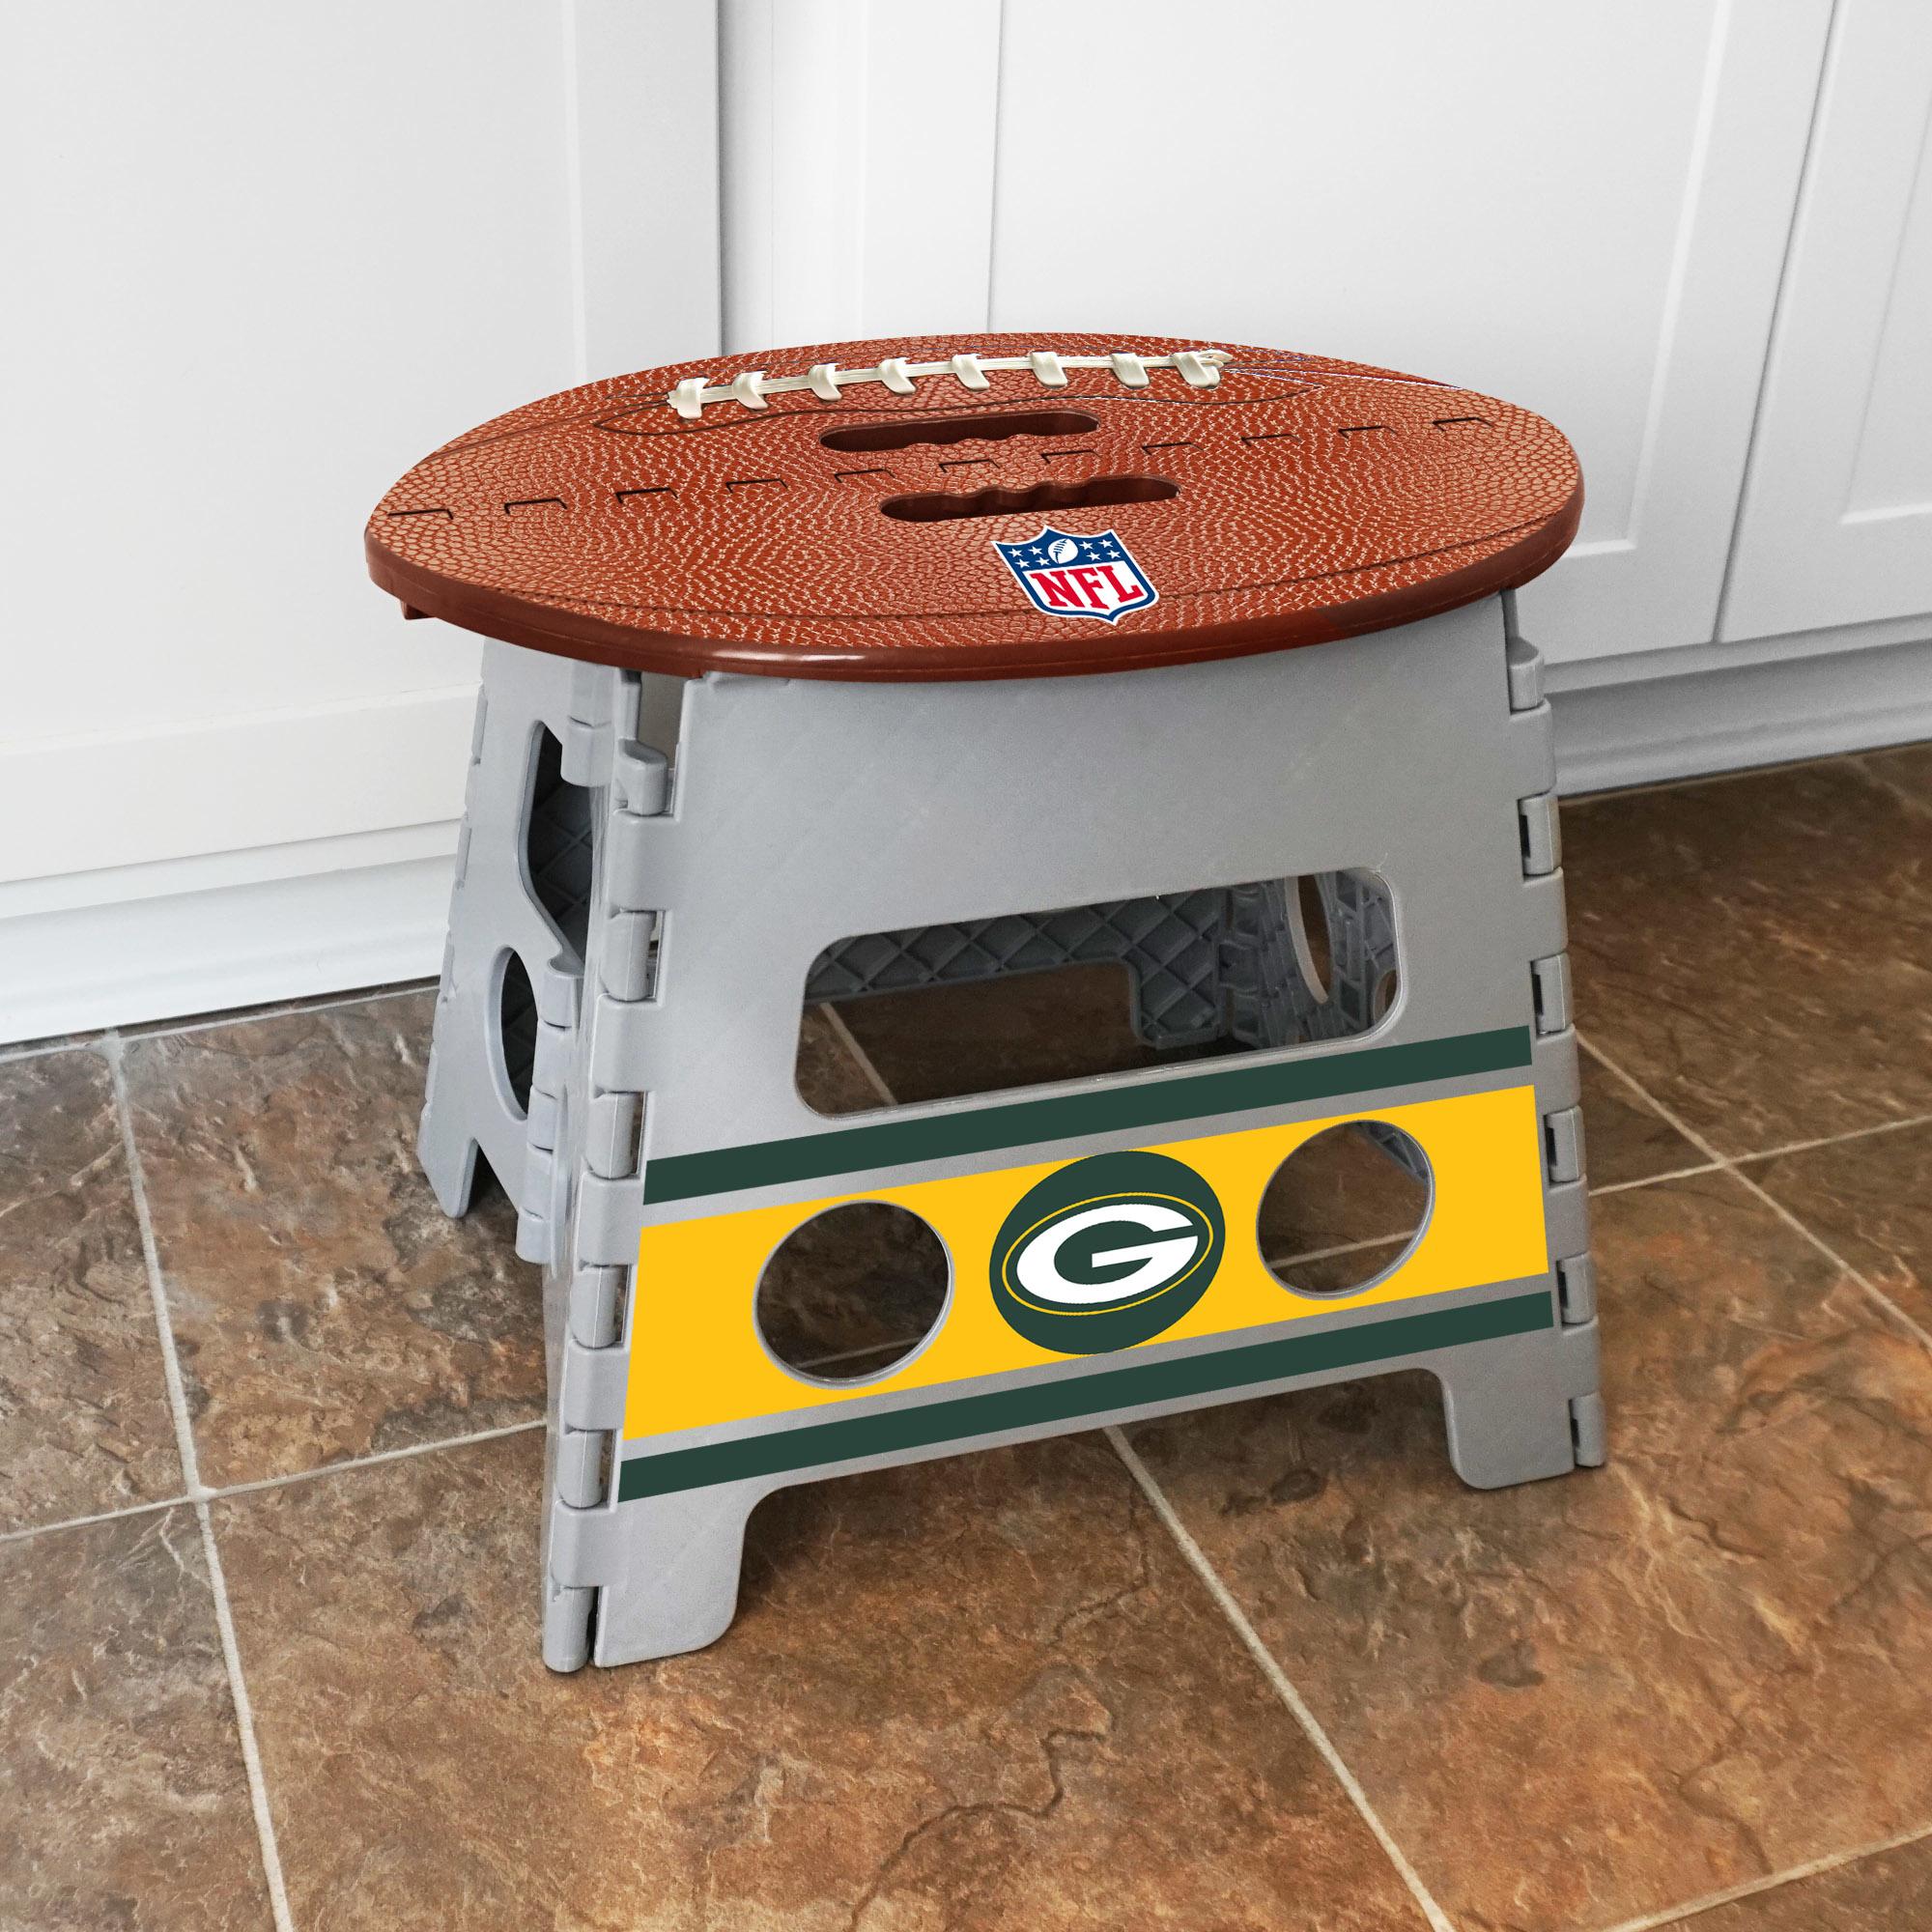 Strange Nfl Green Bay Packers Folding Step Stool Evergreenethics Interior Chair Design Evergreenethicsorg